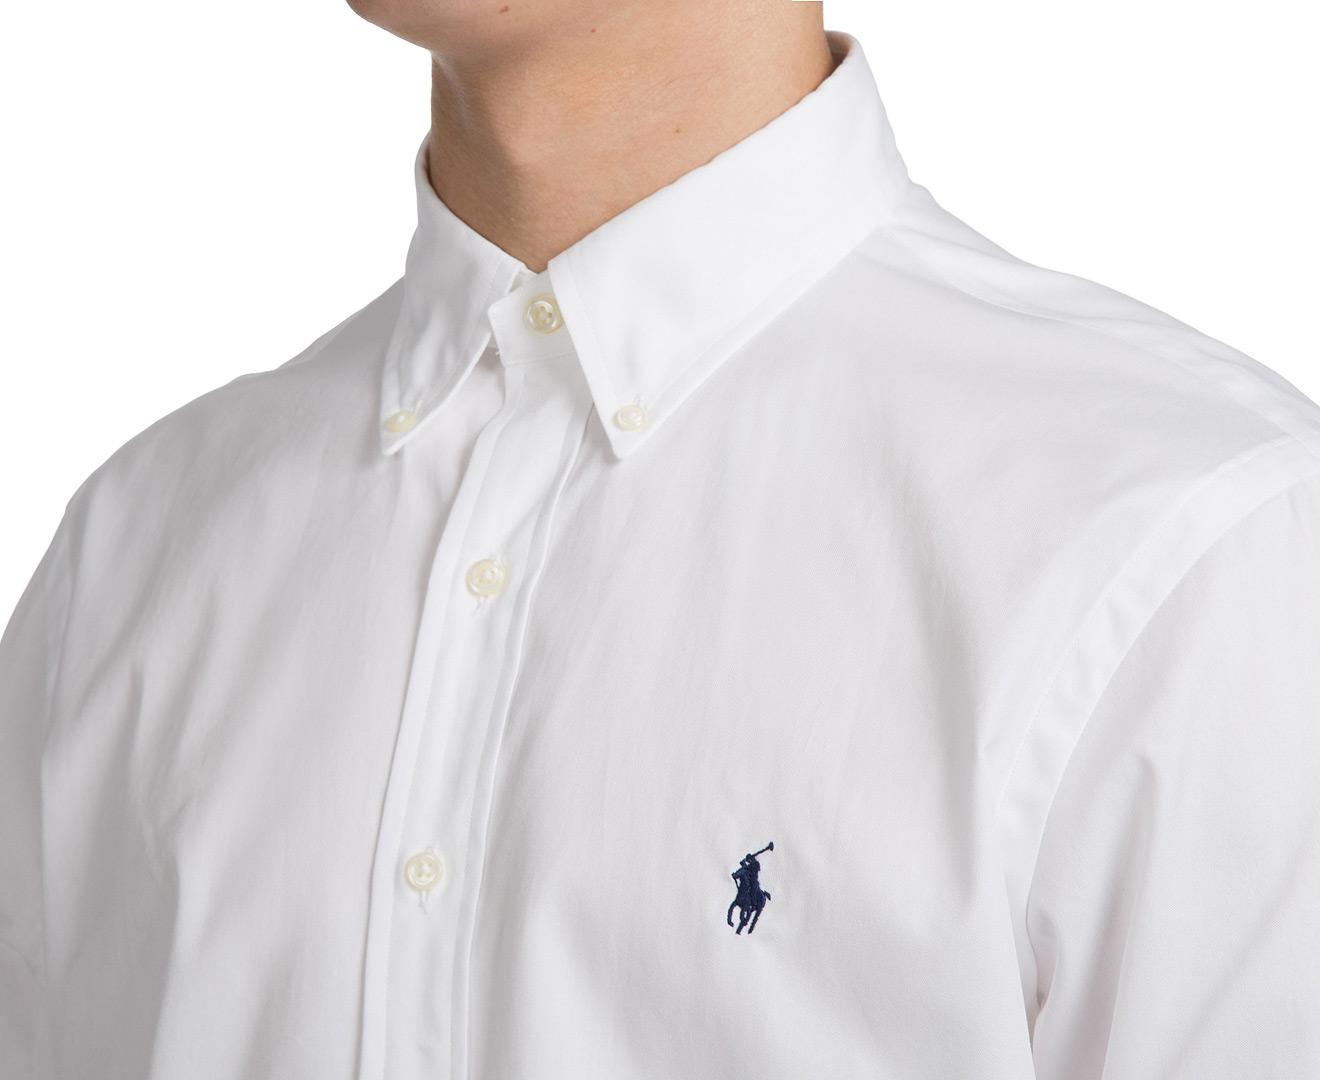 Scoopon Shopping Polo Ralph Lauren Men 39 S Dress Shirt White